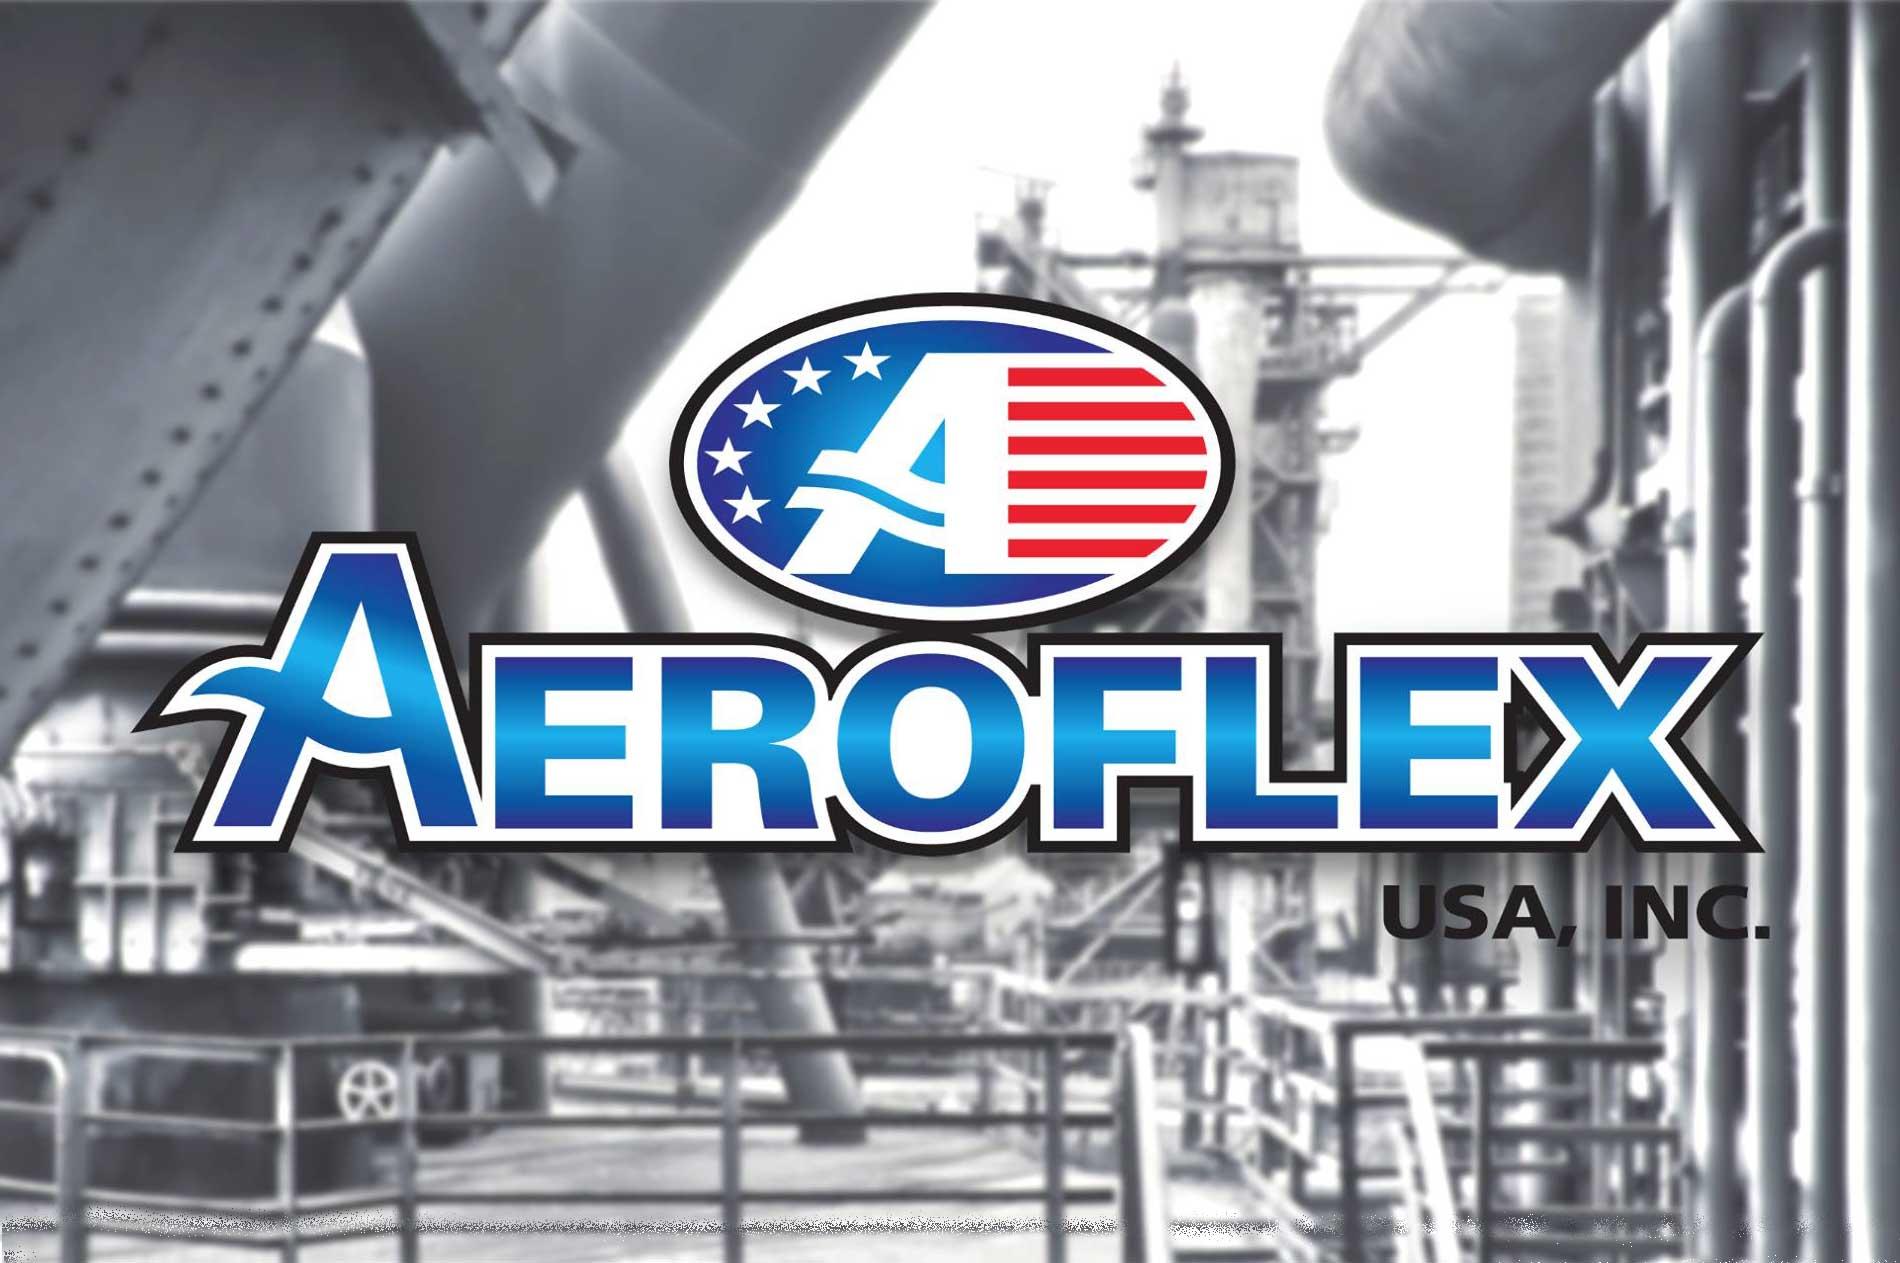 distribuidores-aeroflex